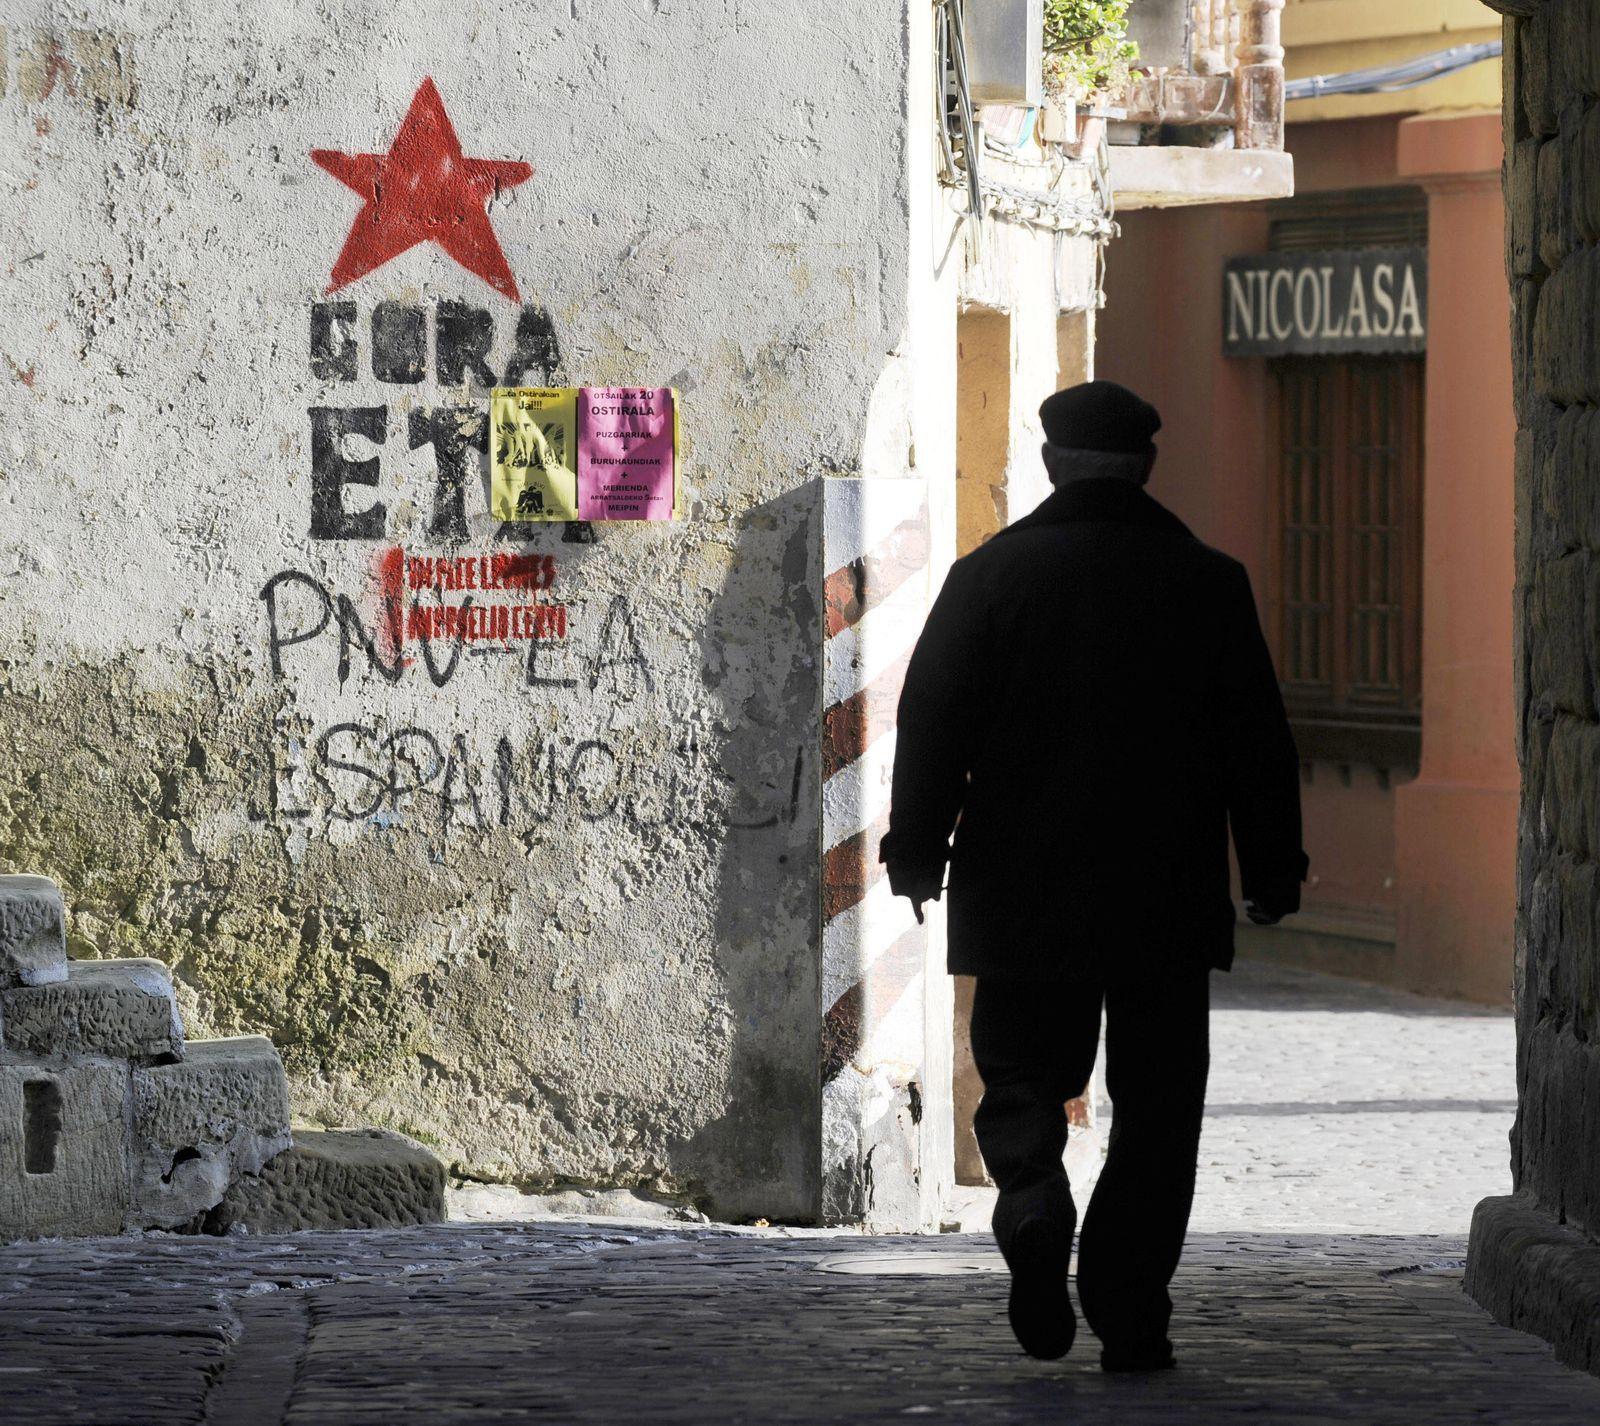 SPAIN-BASQUE-VOTE-ETA-VIOLENCE